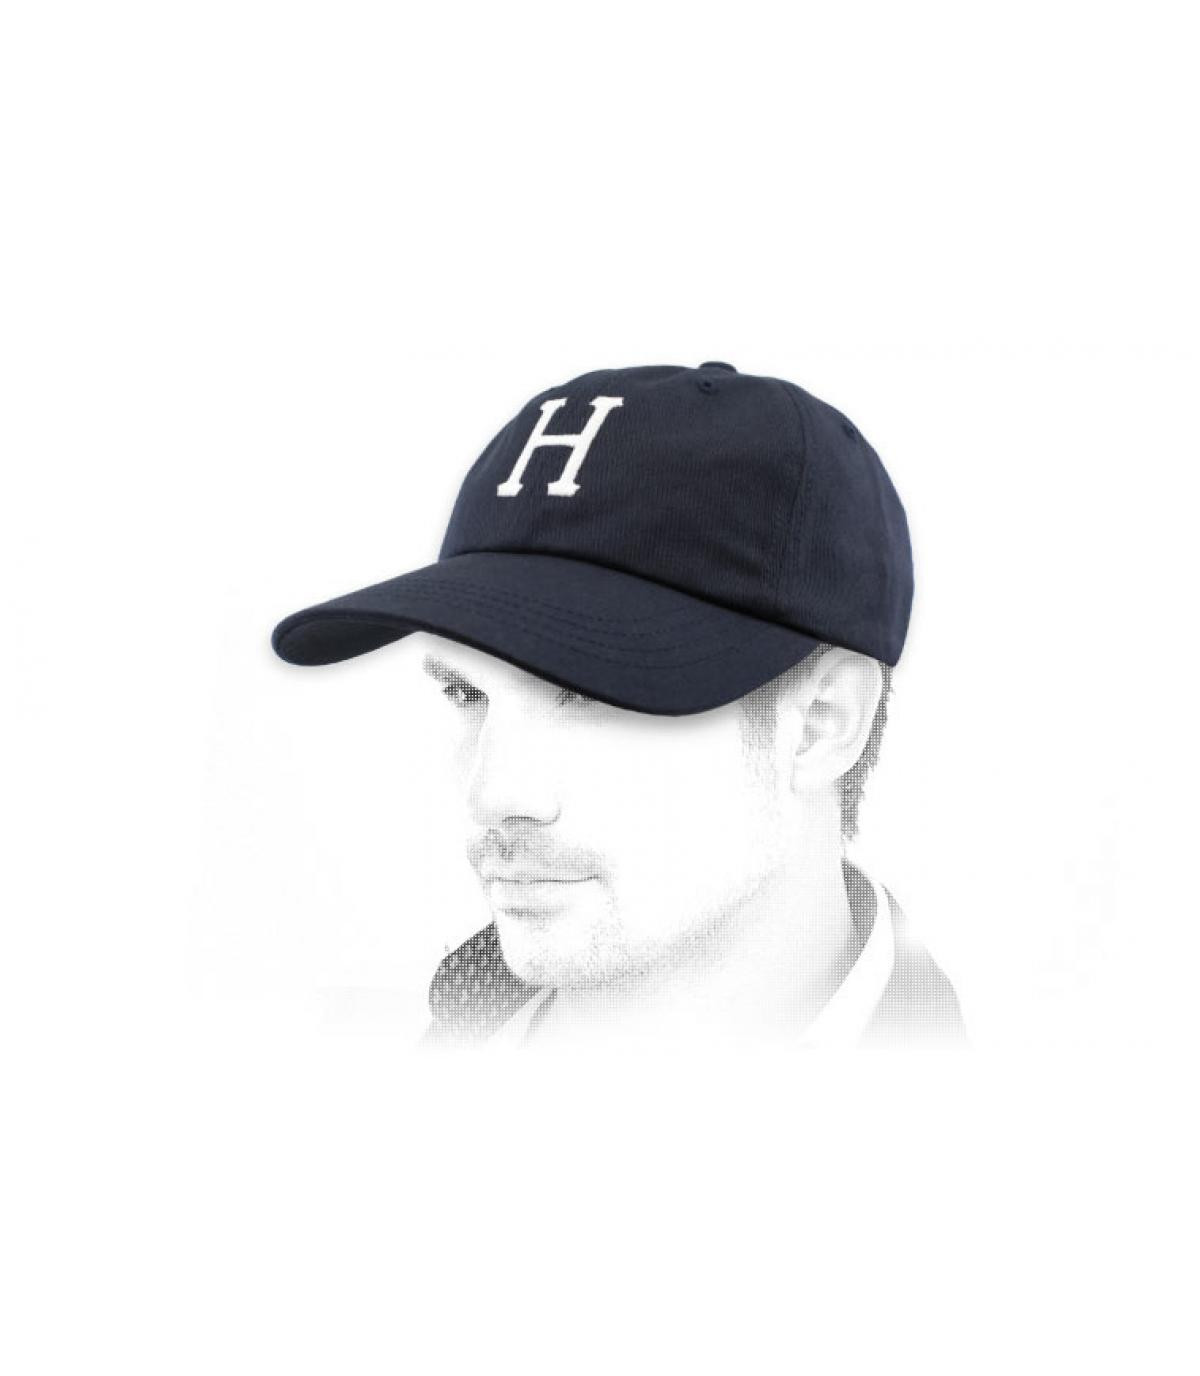 navy blue H cap